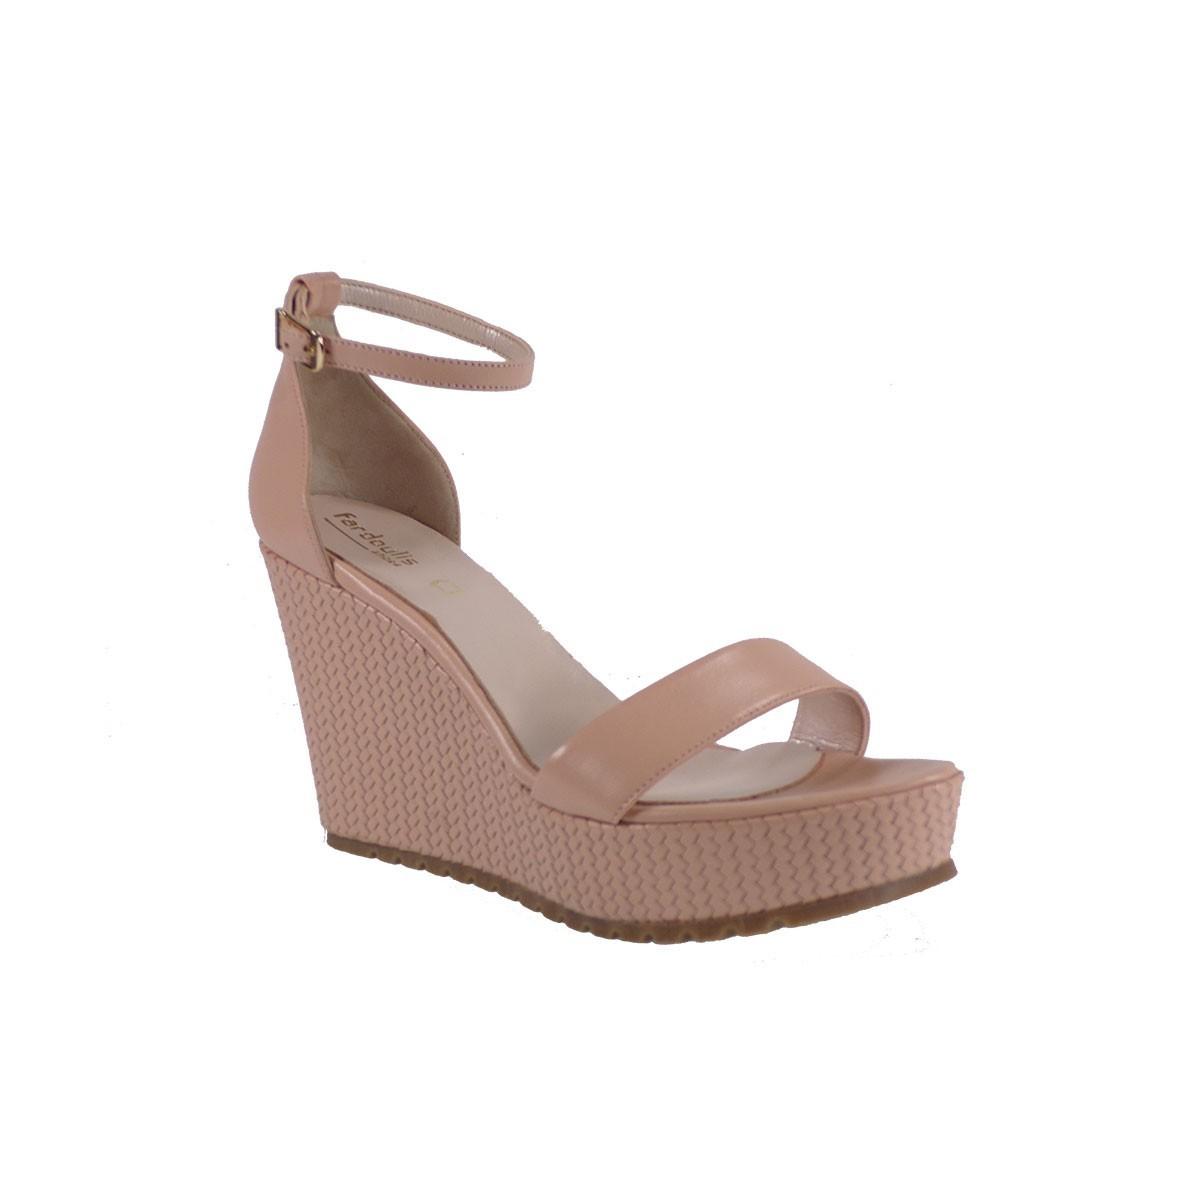 Fardoulis shoes Γυναικείες Πλατφόρμες Πέδιλα 26077 Nude Δέρμα